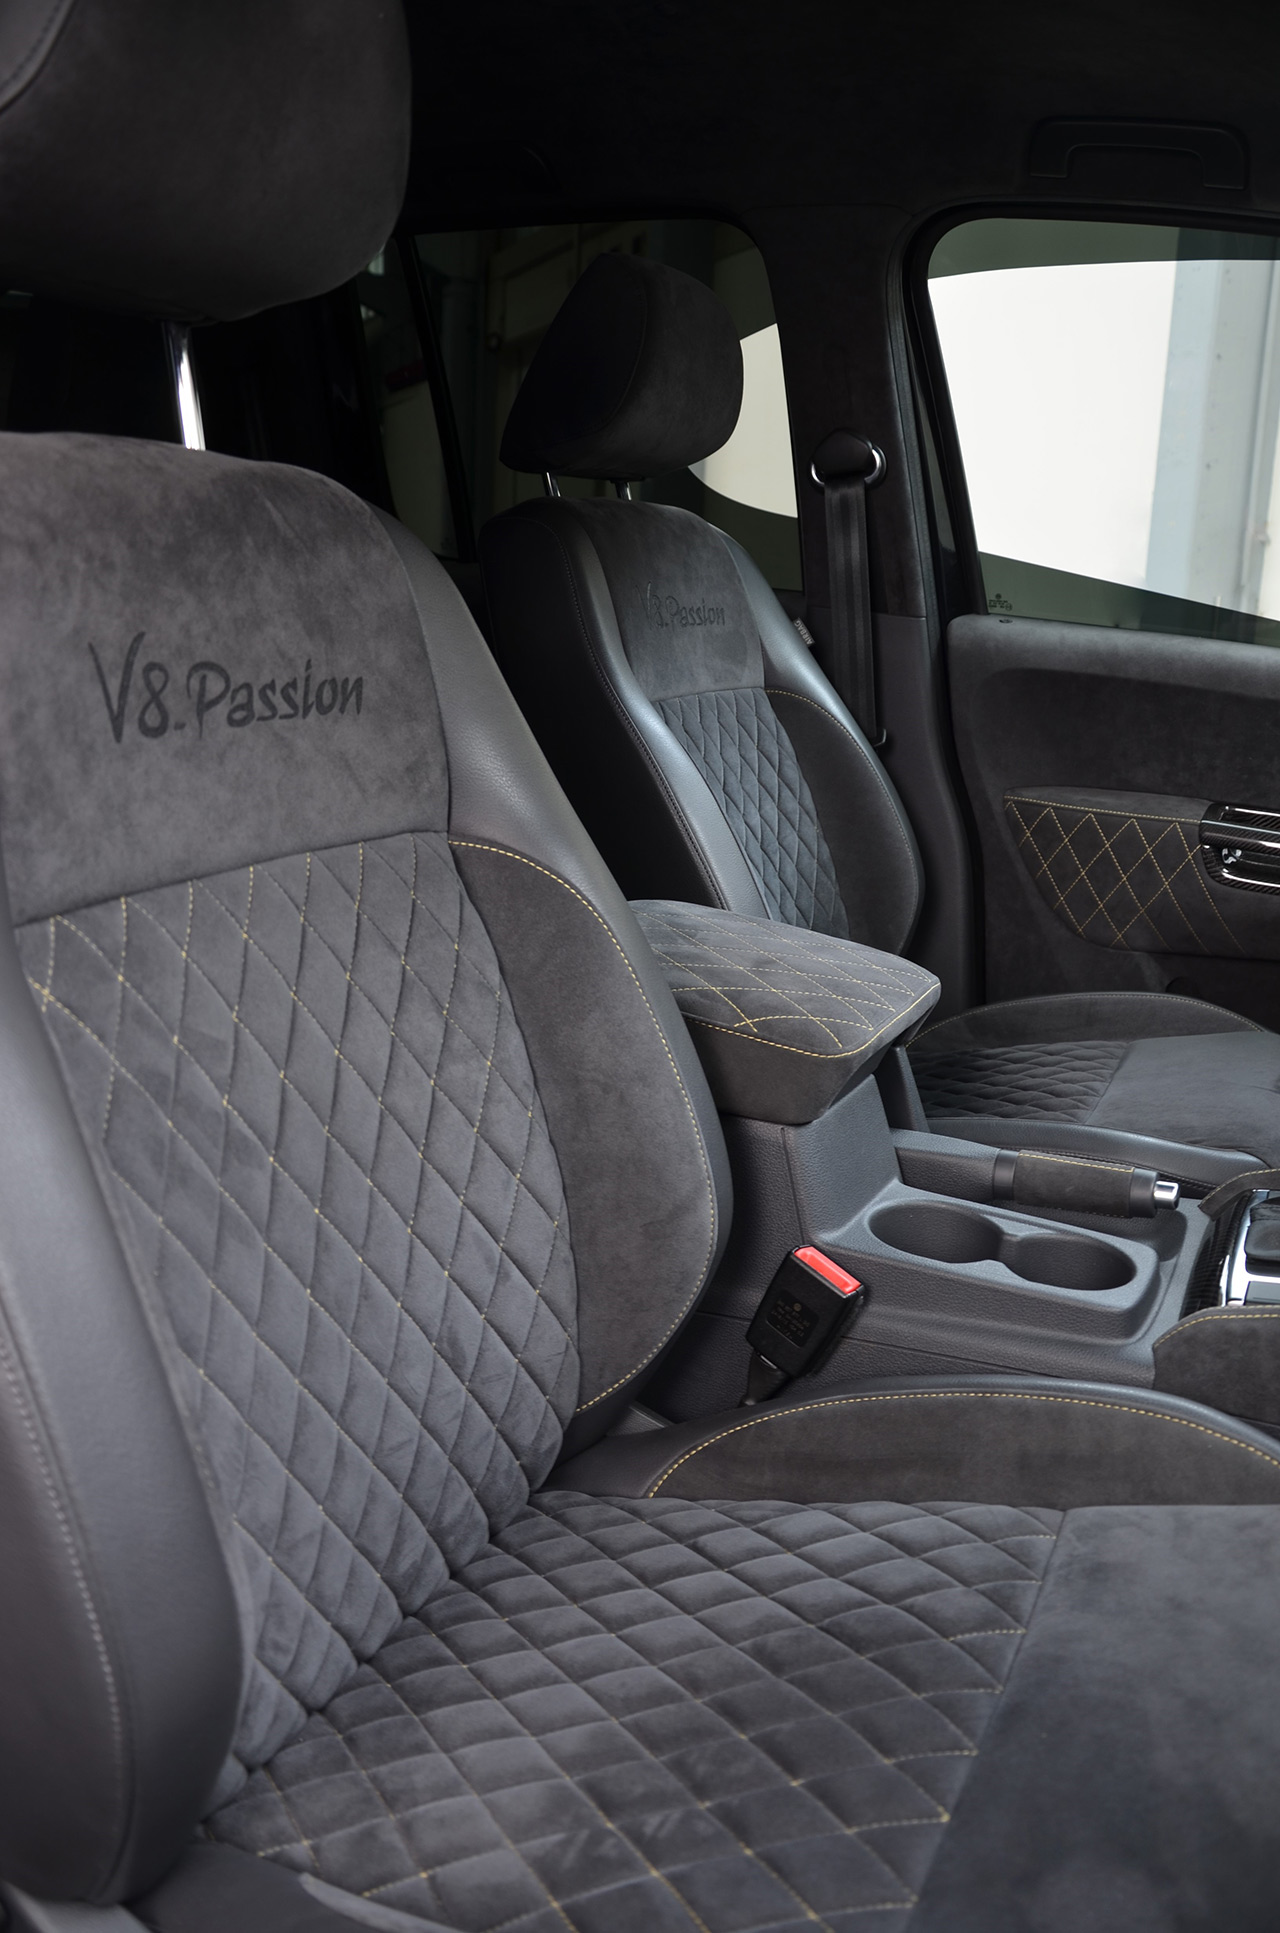 amarok v8 passion desert 5 MTM VW Amarok V8 Passion Desert